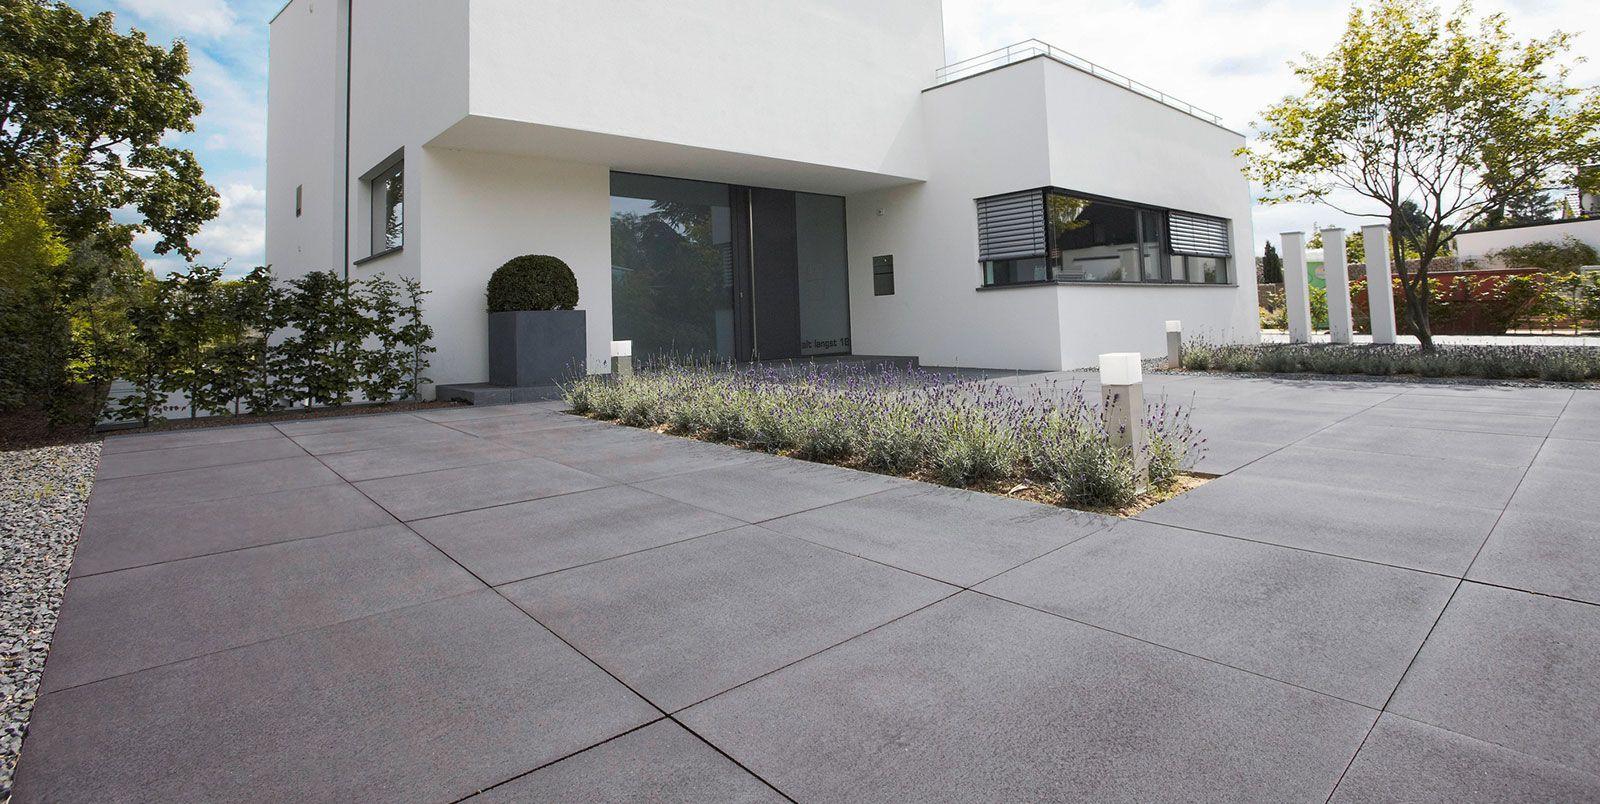 Terrace Paving Modern Modern Paving Terrace Home Pavement In